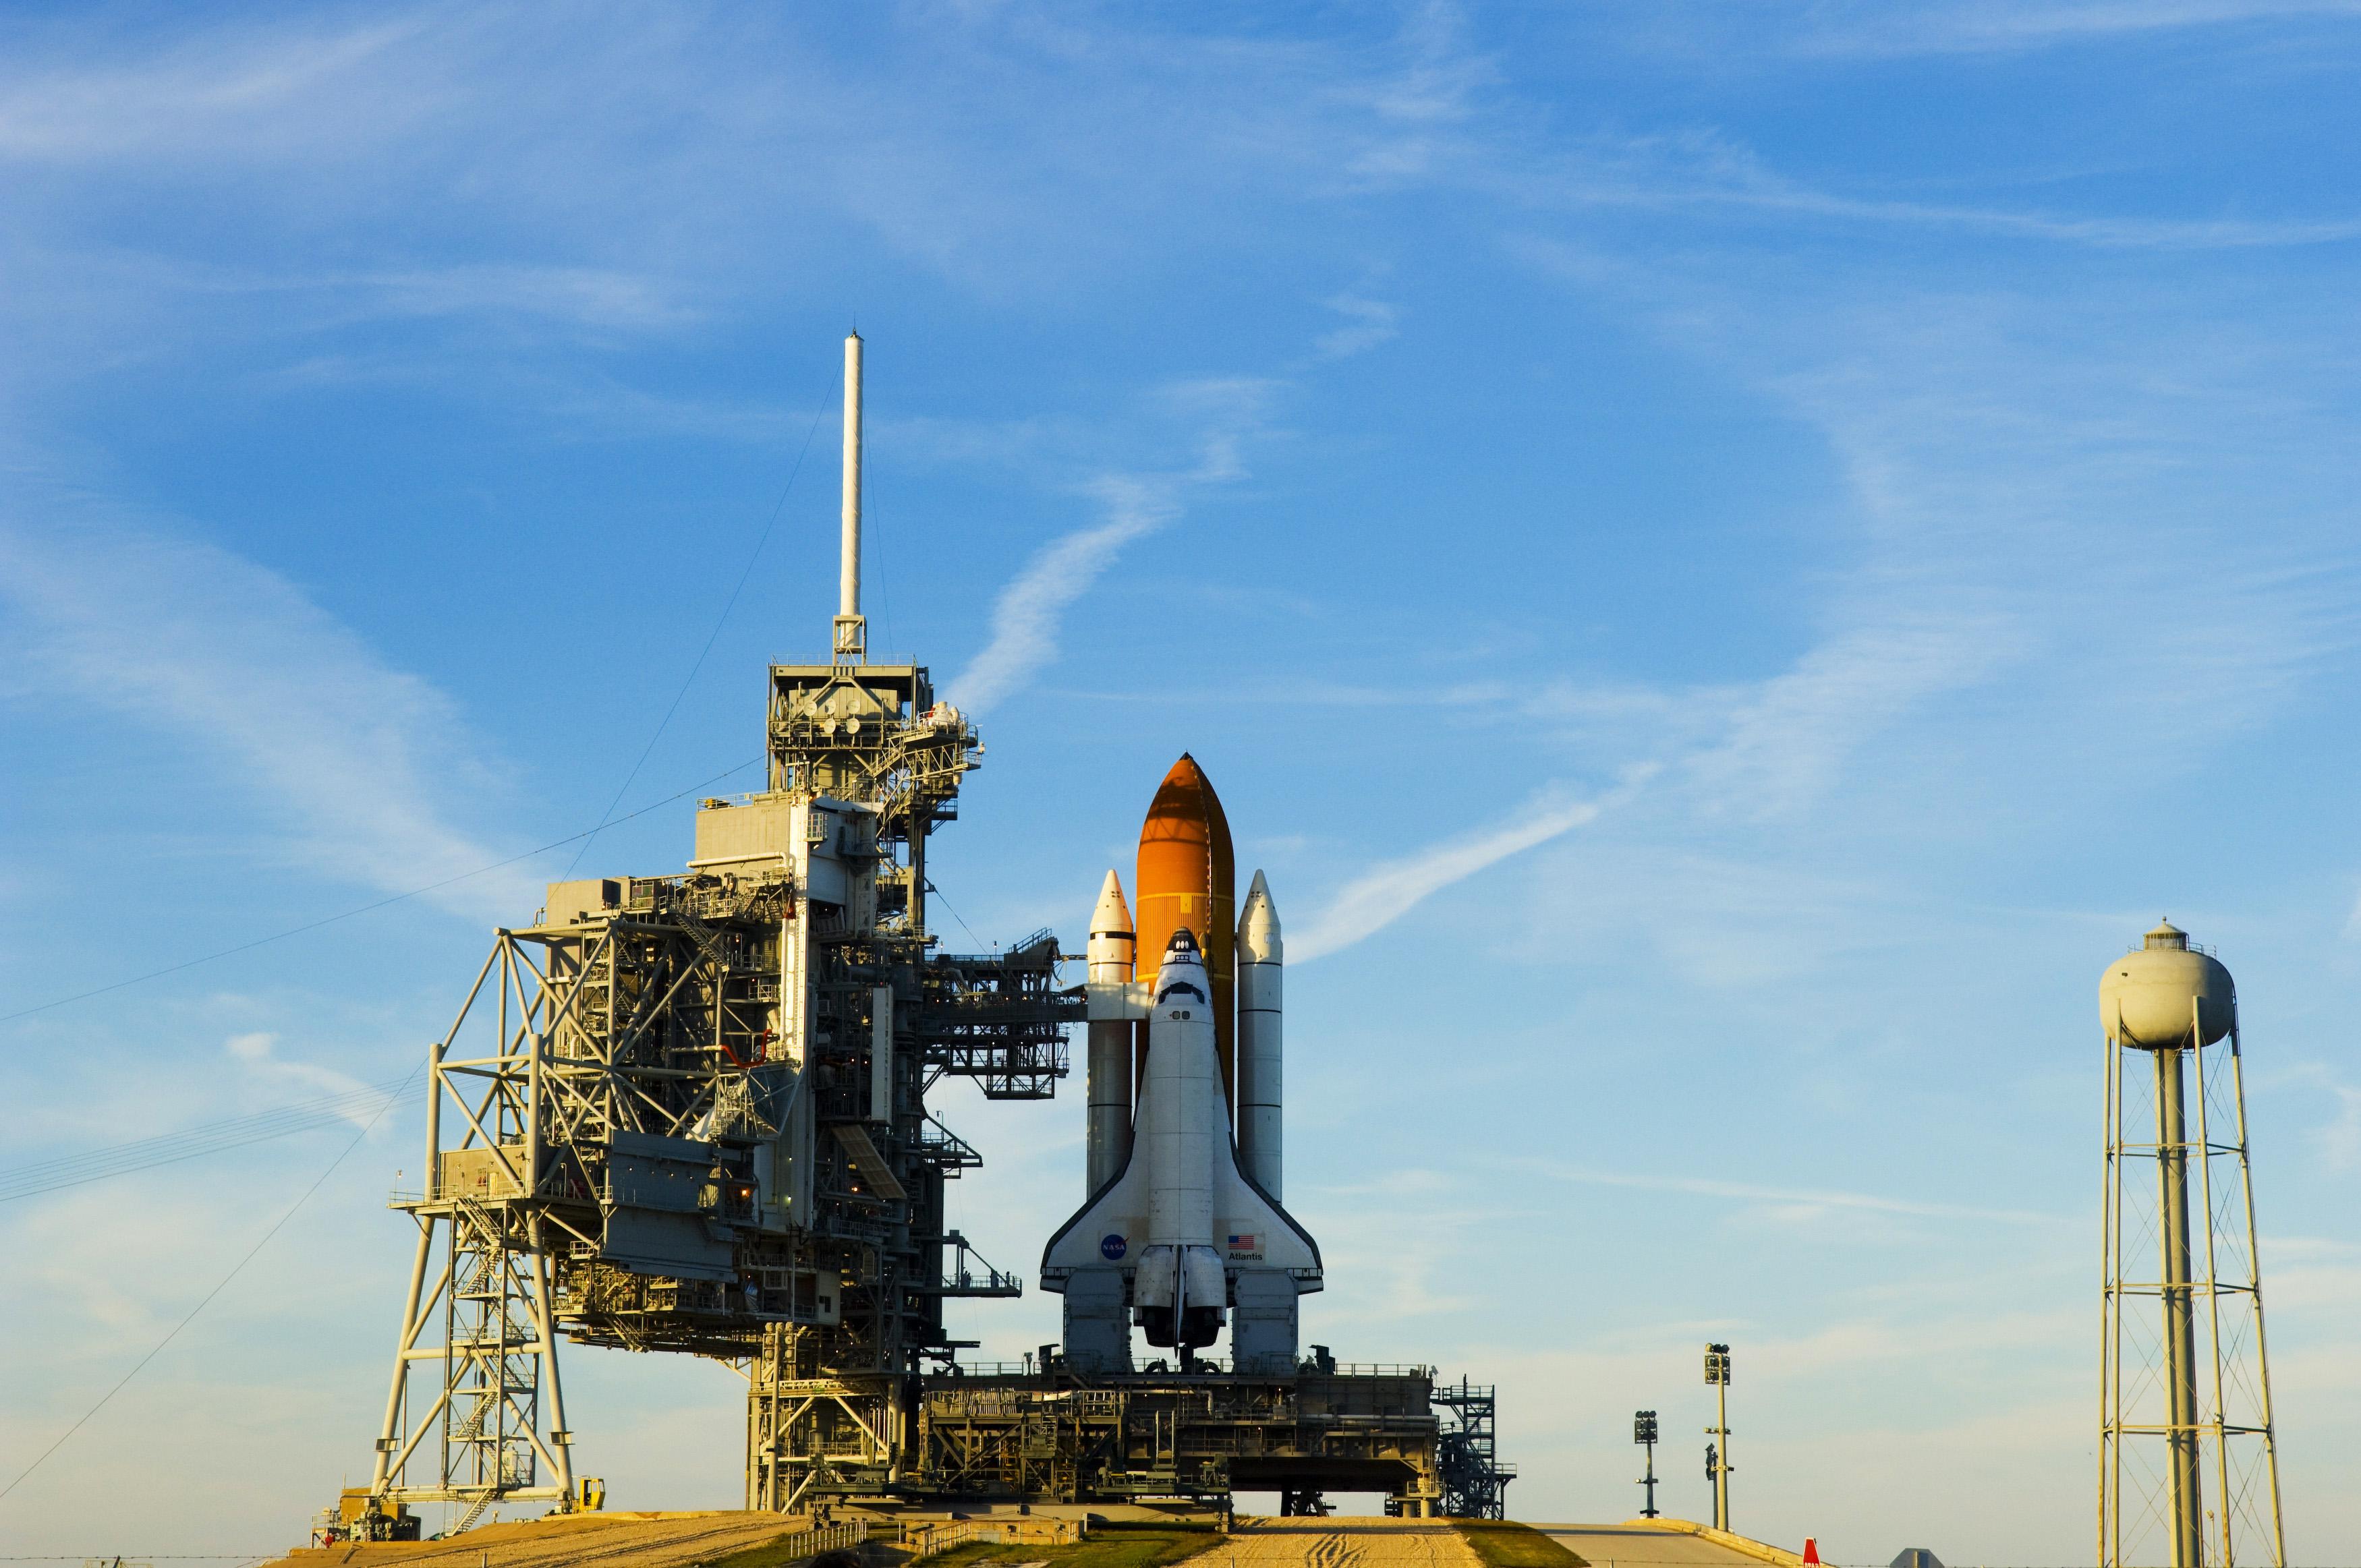 space shuttle landing pad - photo #25